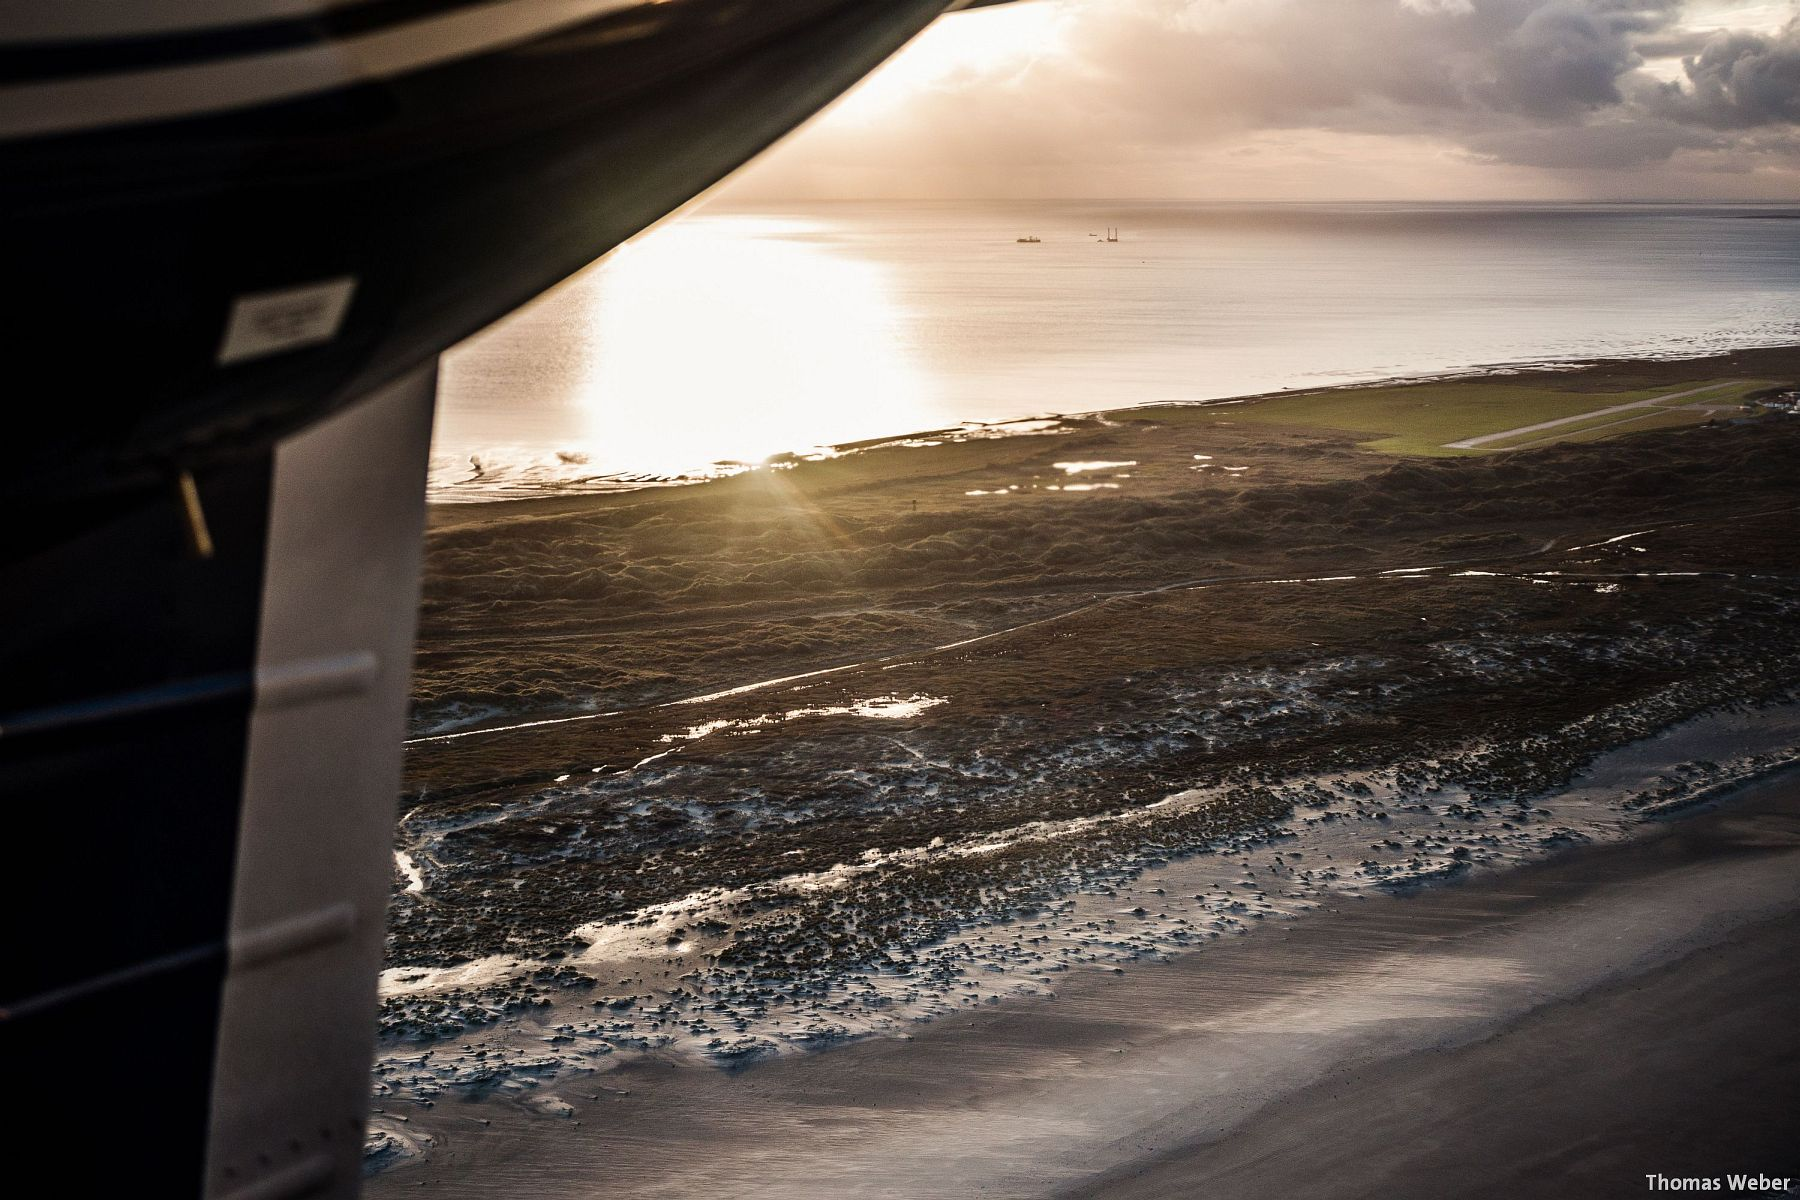 Fotograf Thomas Weber aus Oldenburg: Flucht vor dem Orkan Xaver mit dem Inselflieger Juist (8)